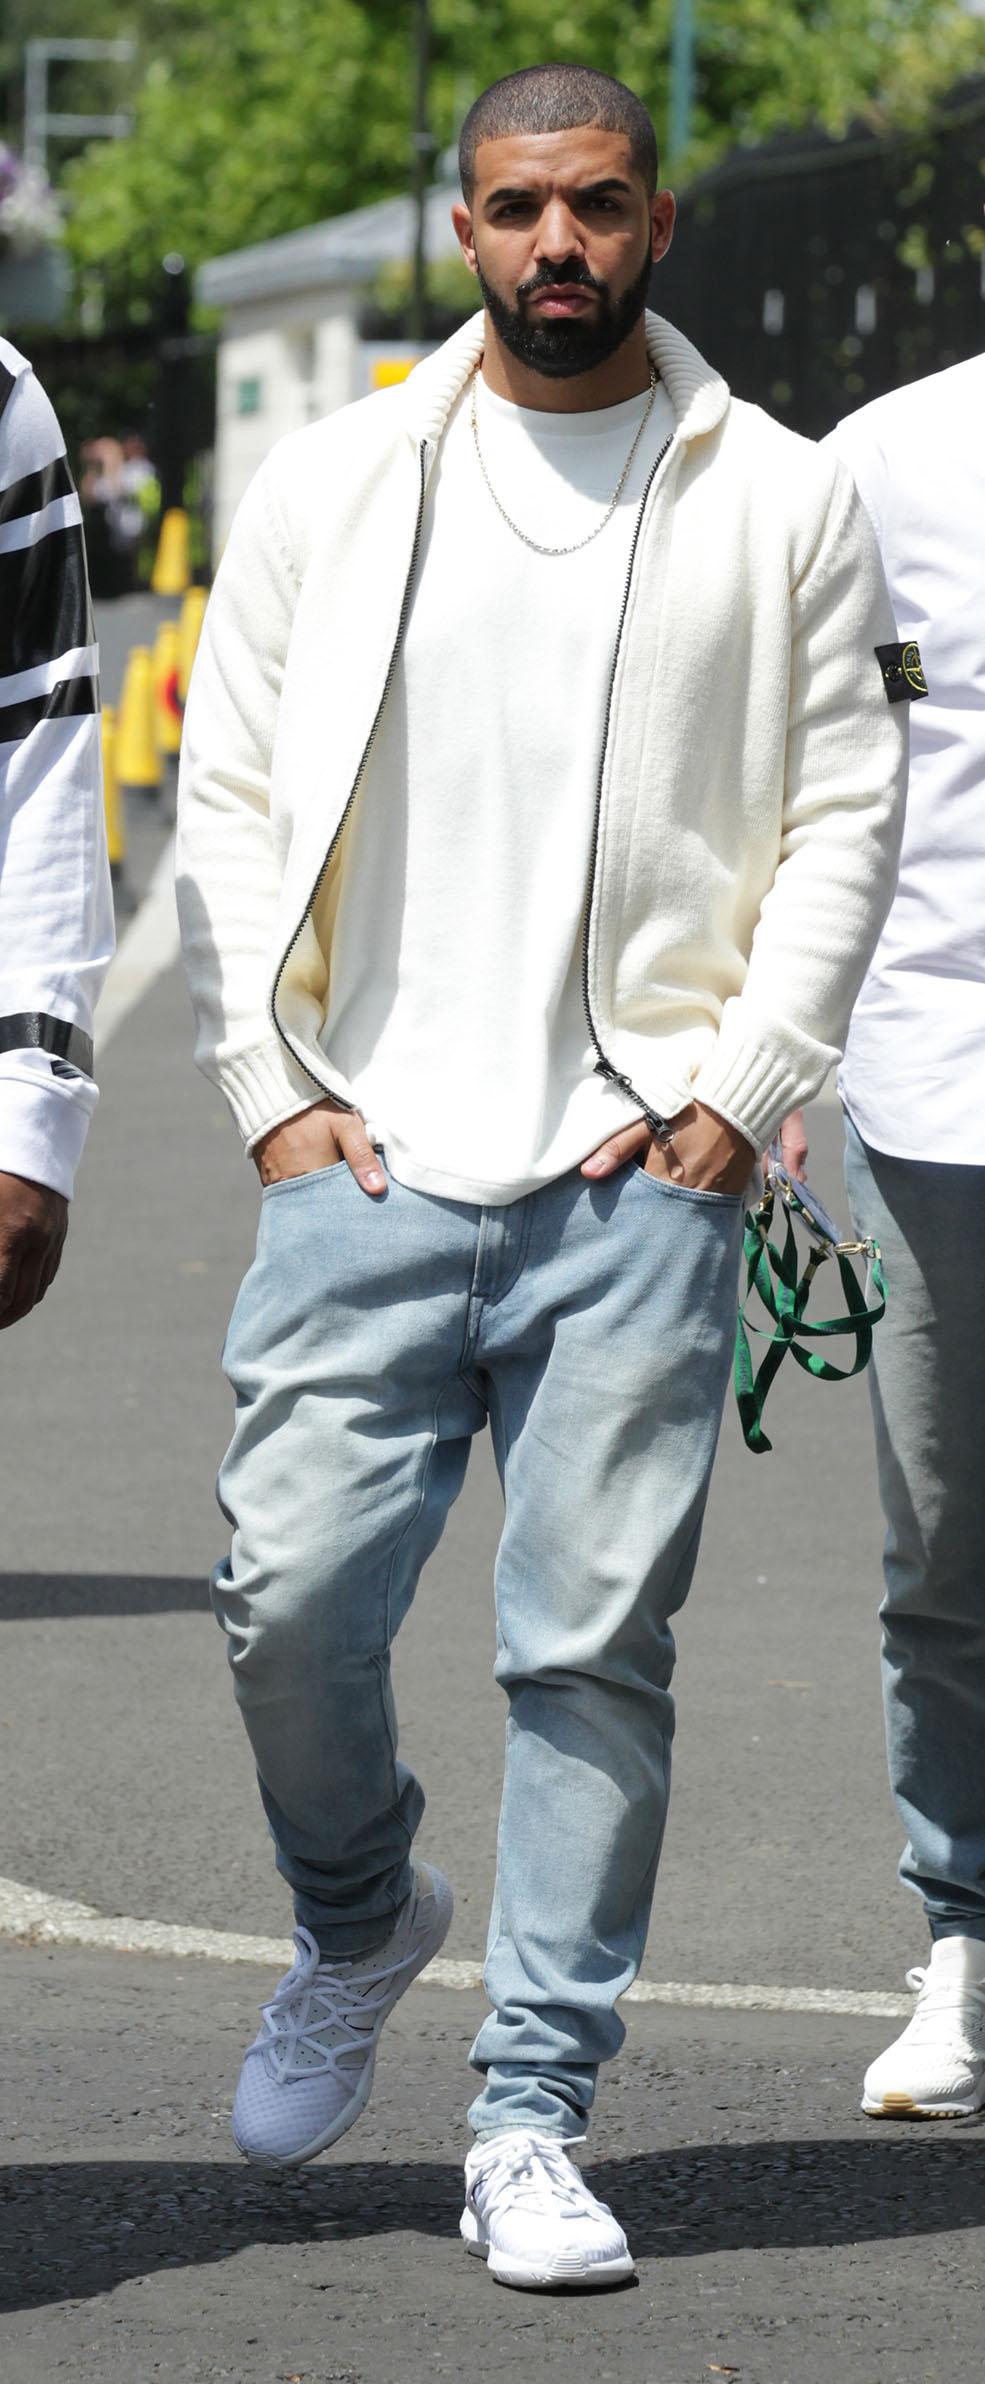 Drake (Aubrey Drake Graham ) seen at Wimbledon Championships on Jul 11, 2015 in London (Twocoms/Shutterstock)